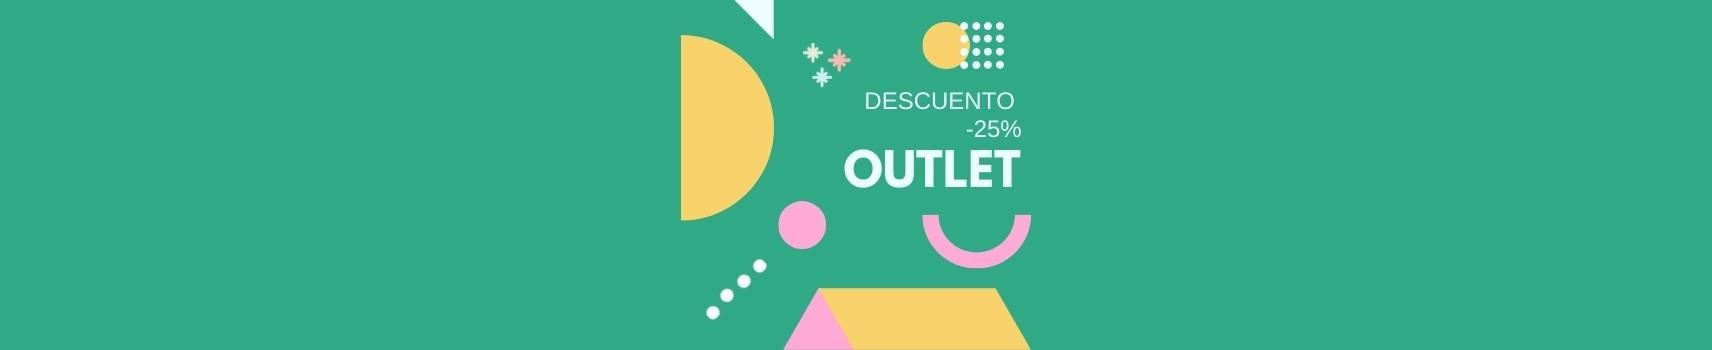 DESCUENTO -25%